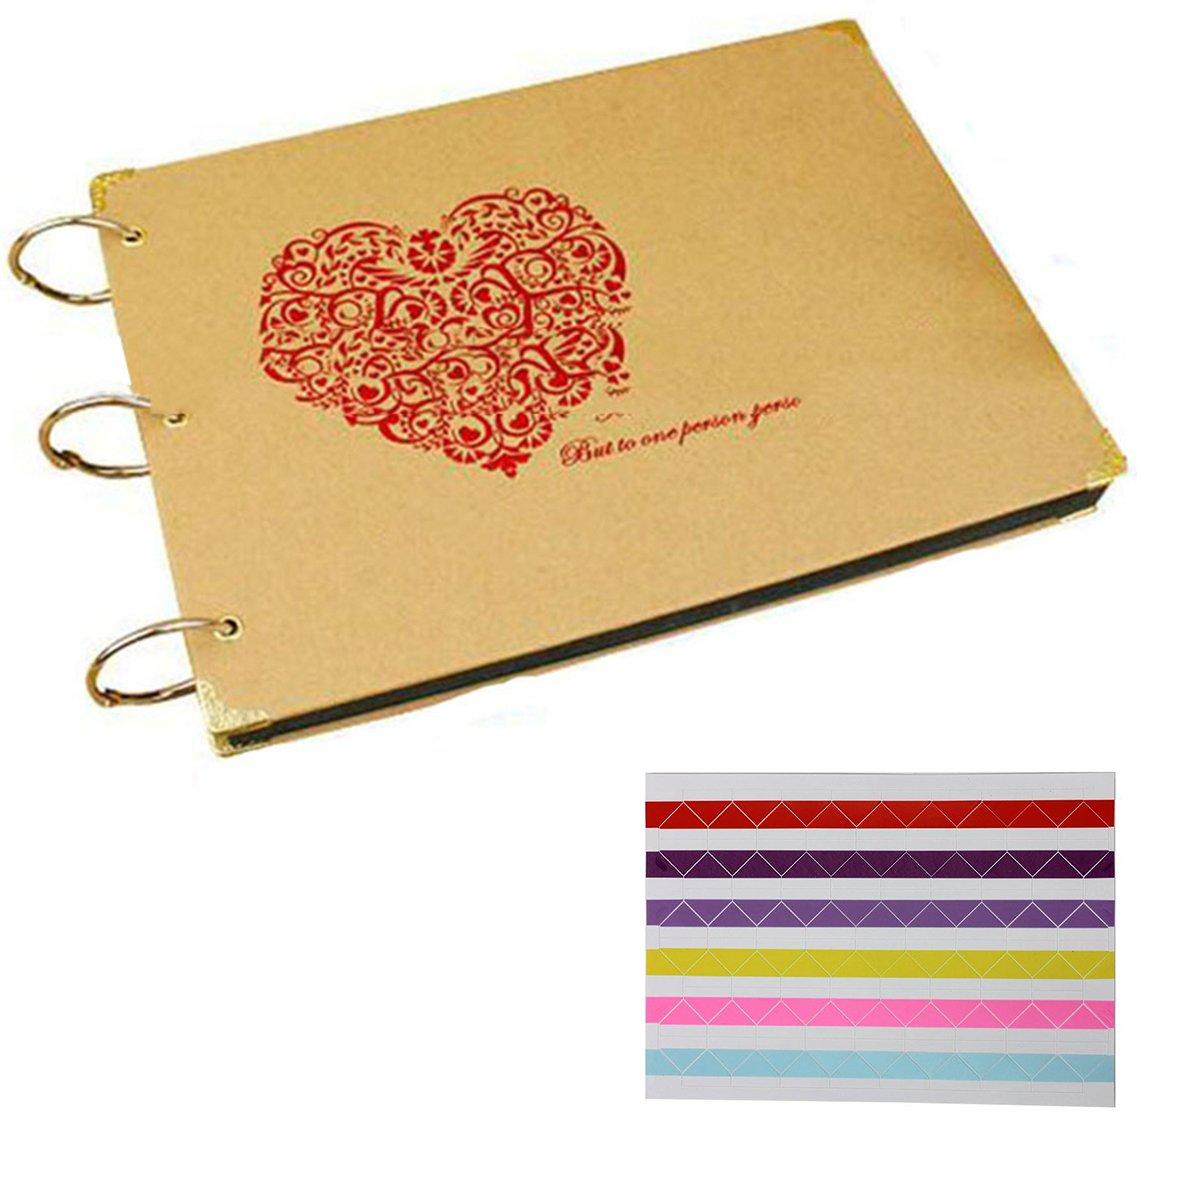 ARHSSZY 10 inch DIY Handmade Photo Album Wedding Gift Baby Lovers Family Memory Paste Photo Albums